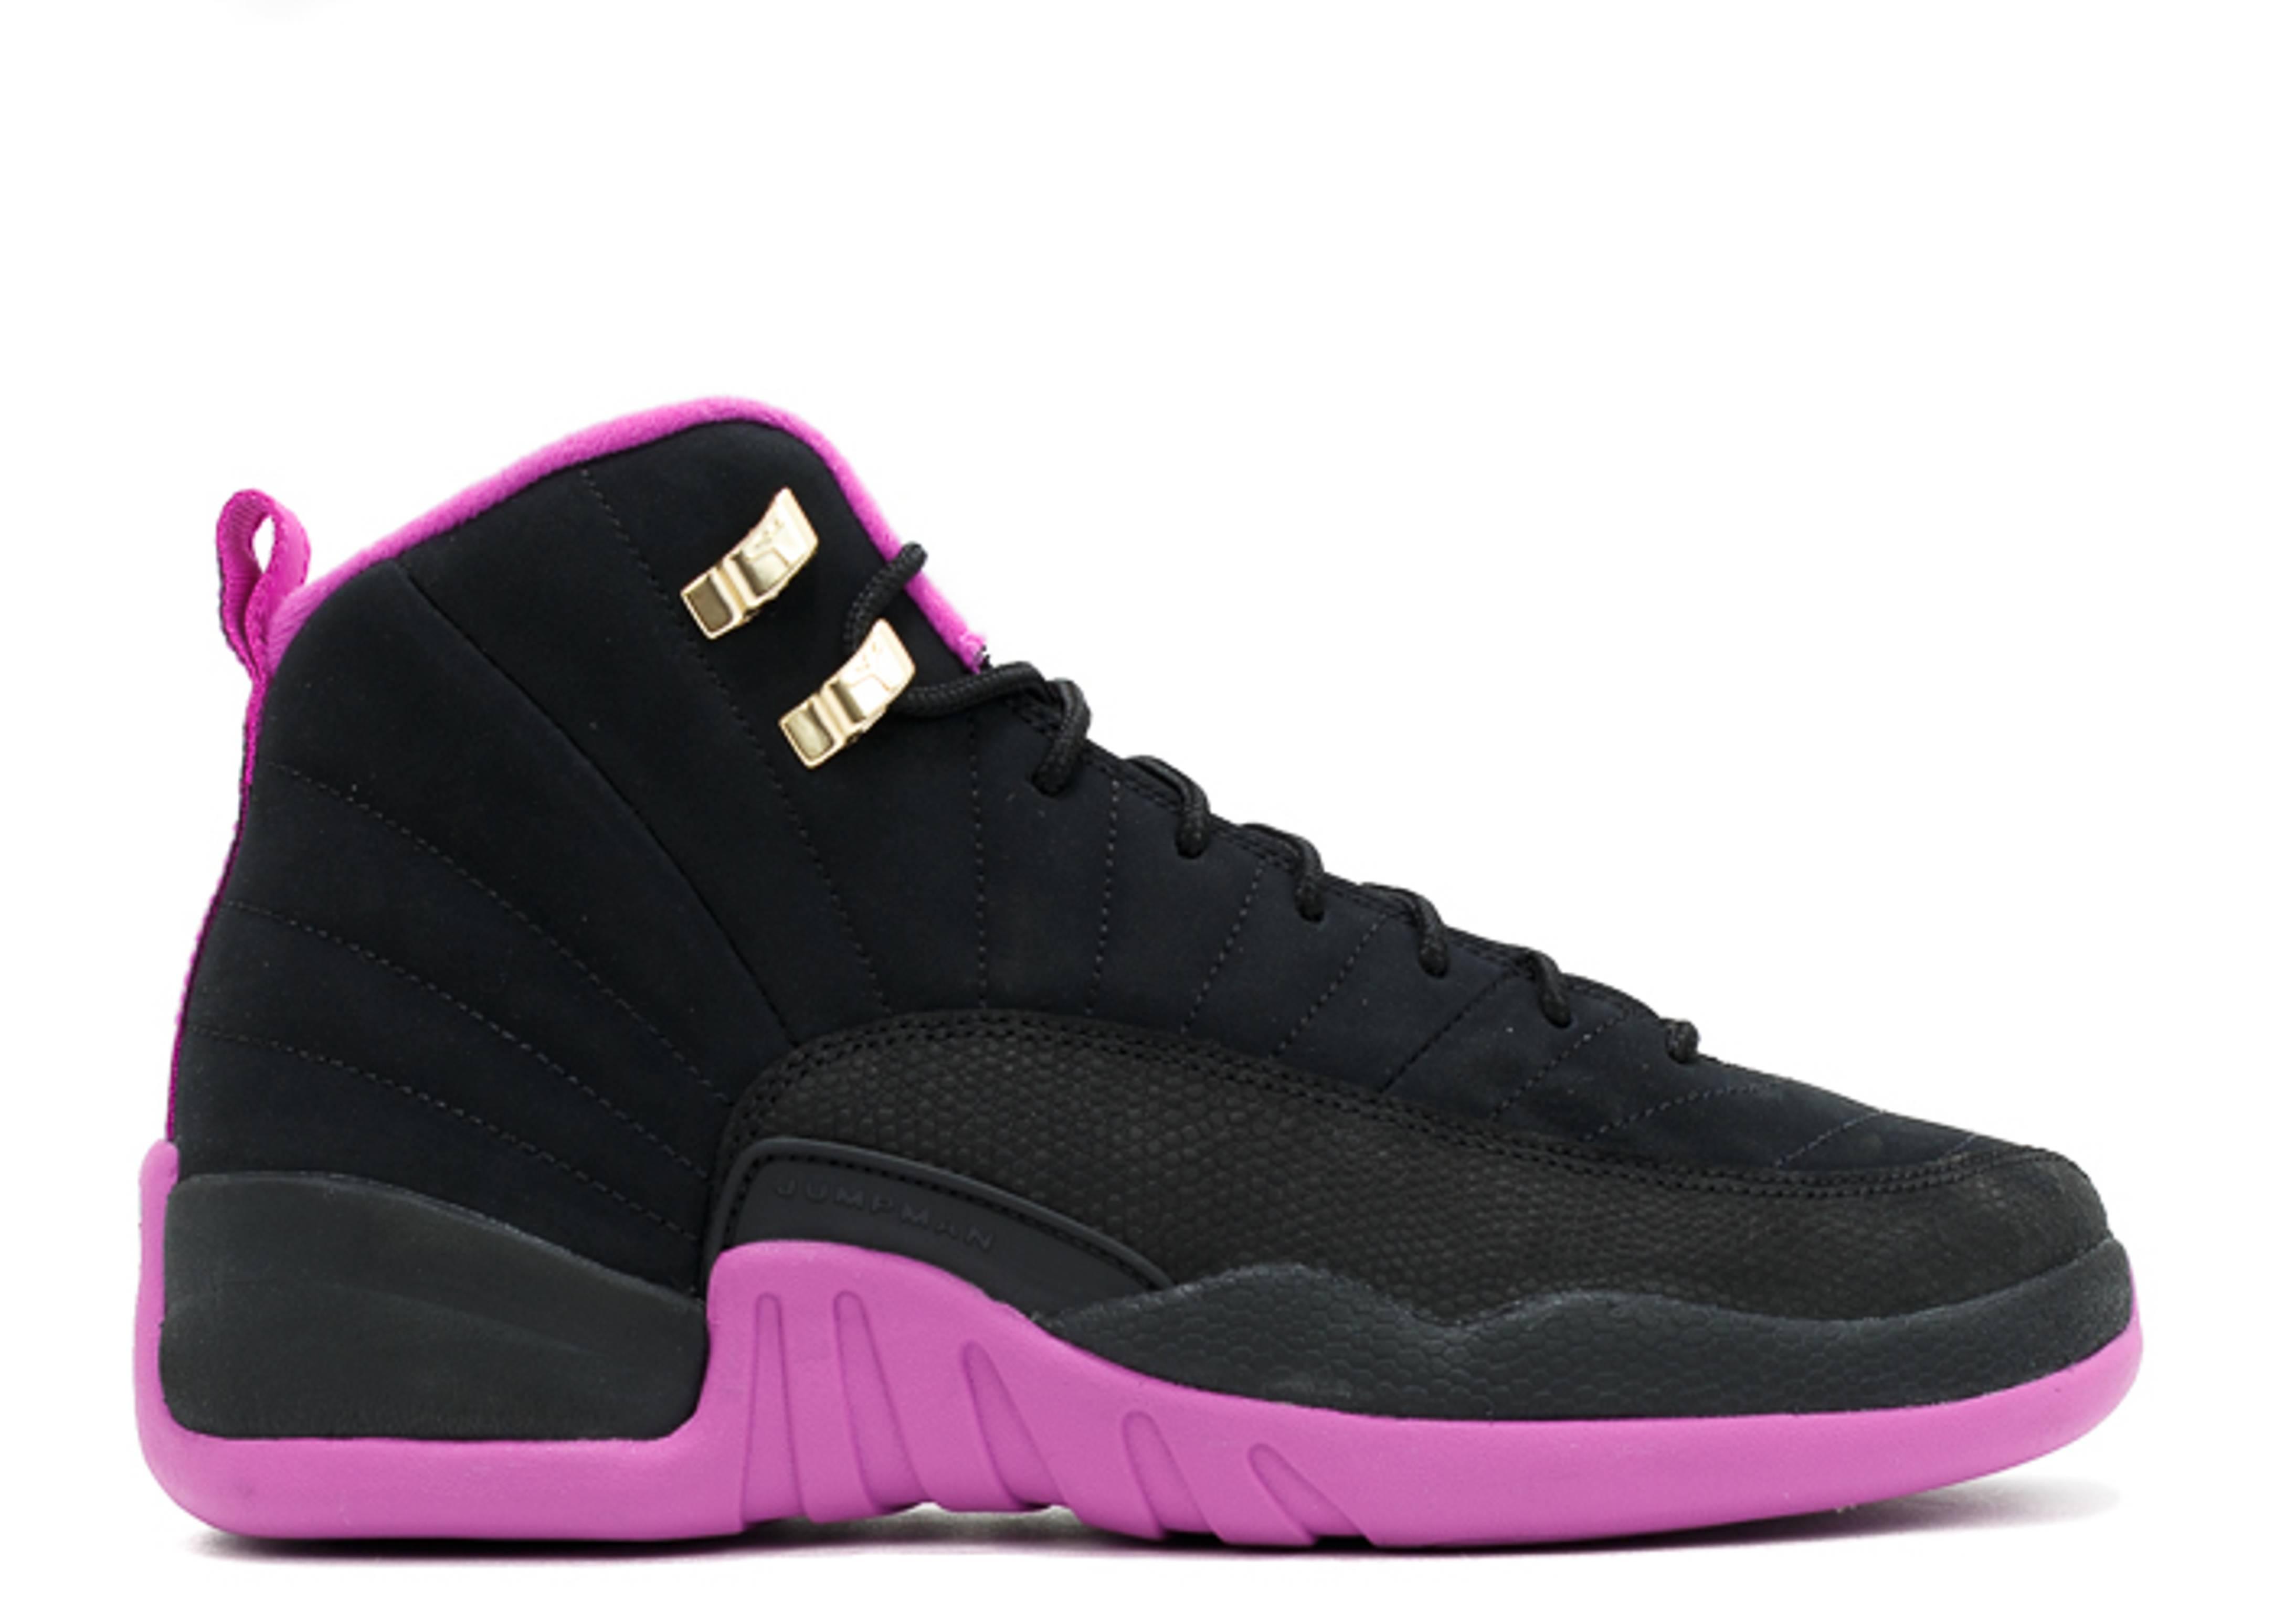 Air Jordan 12 Black